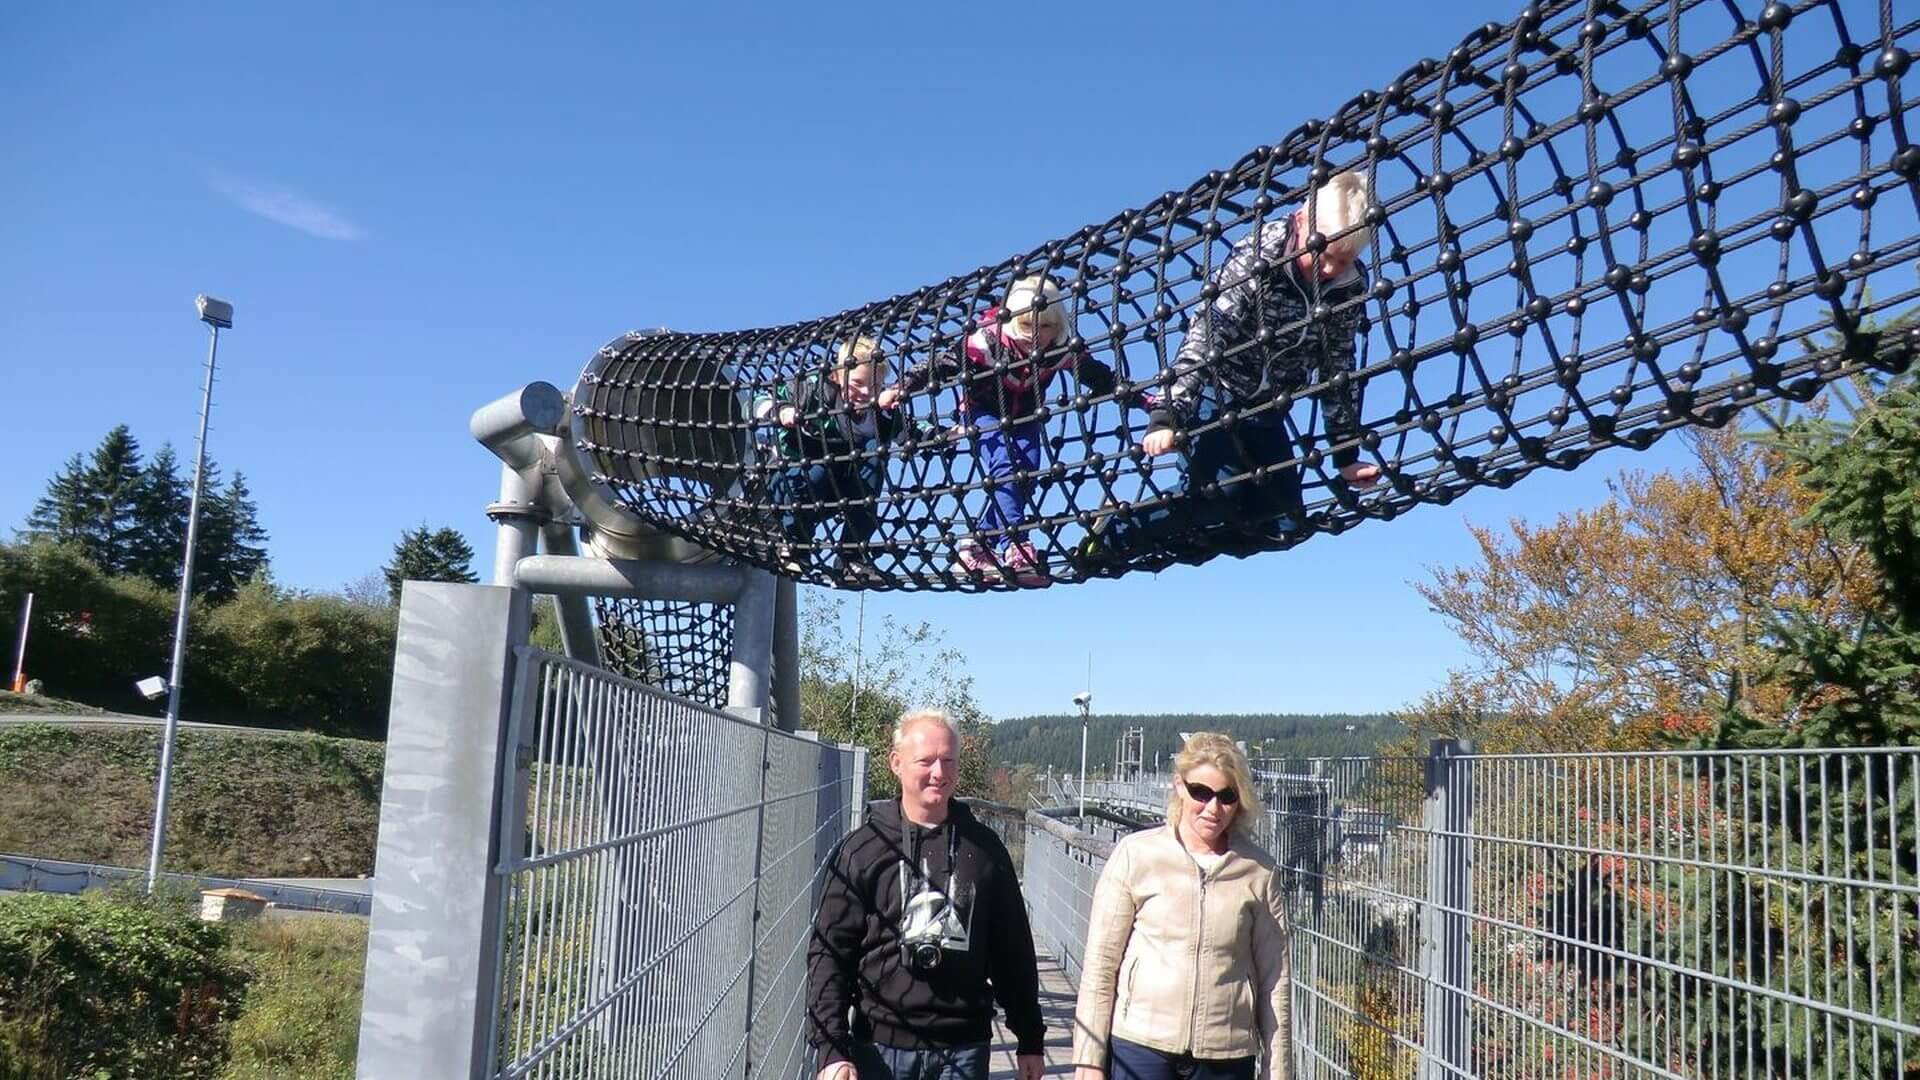 Familie klettern Panorama Erlebnis Brücke Winterberg